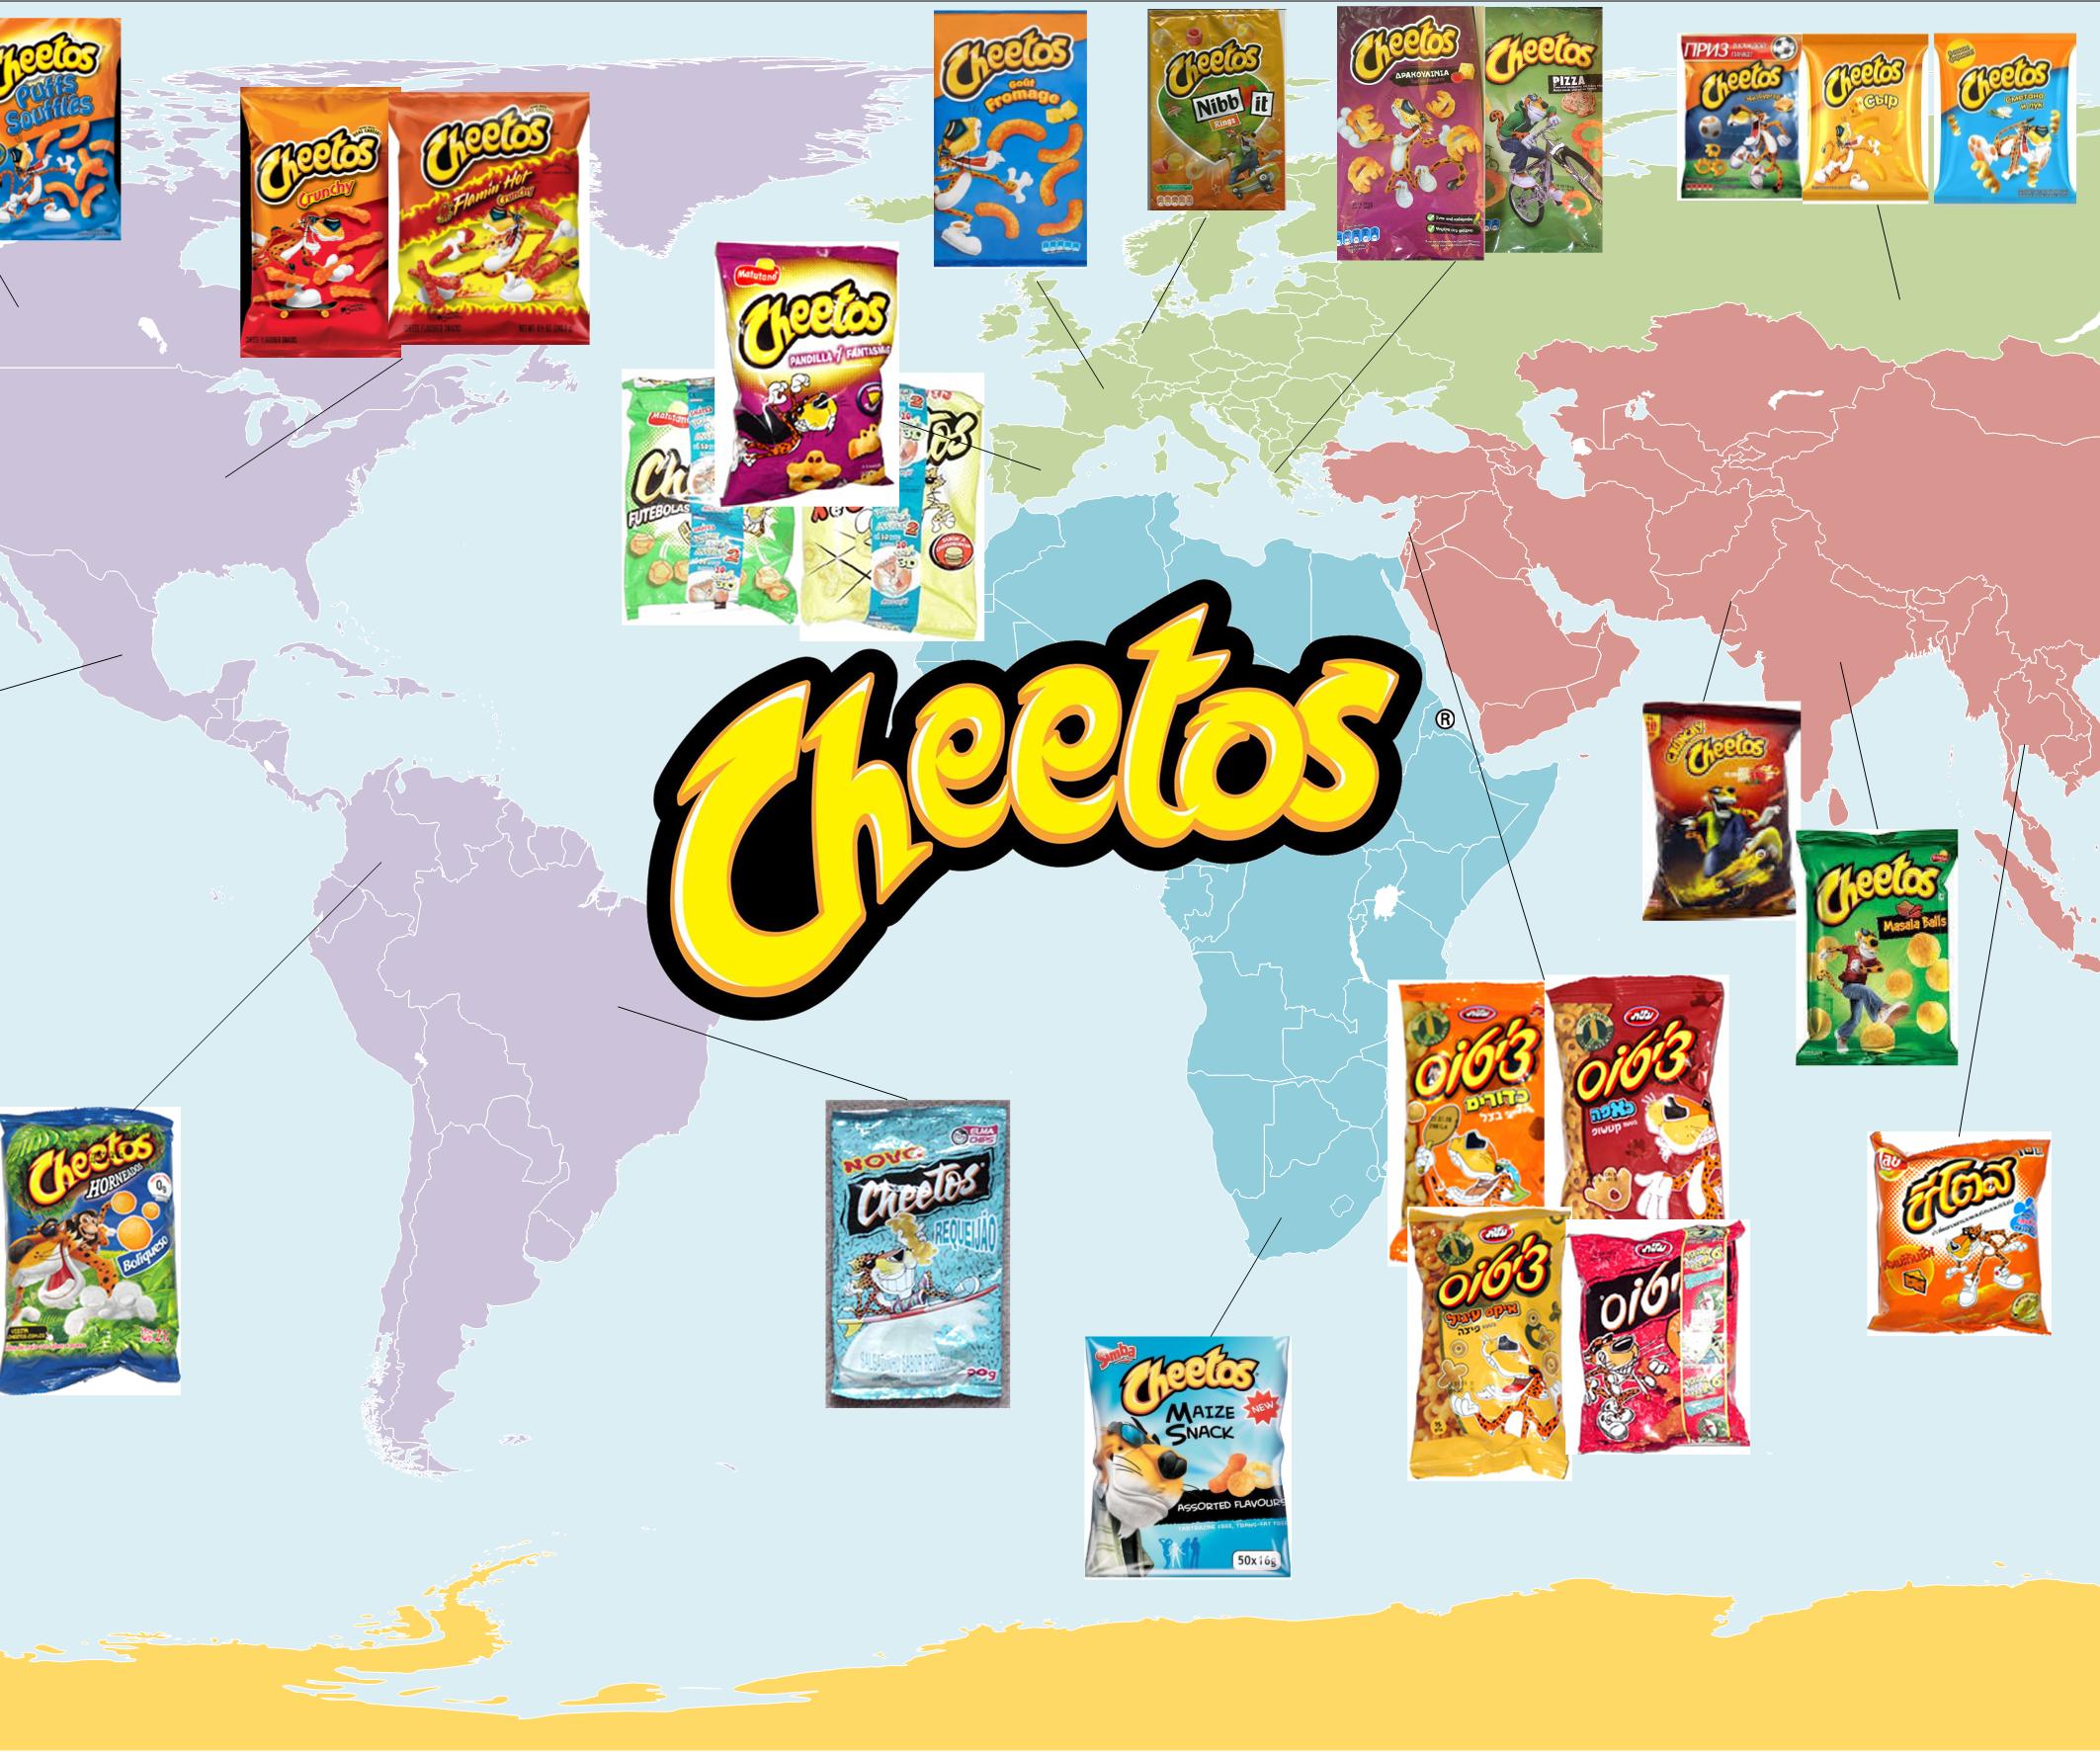 Cheetos Around the World